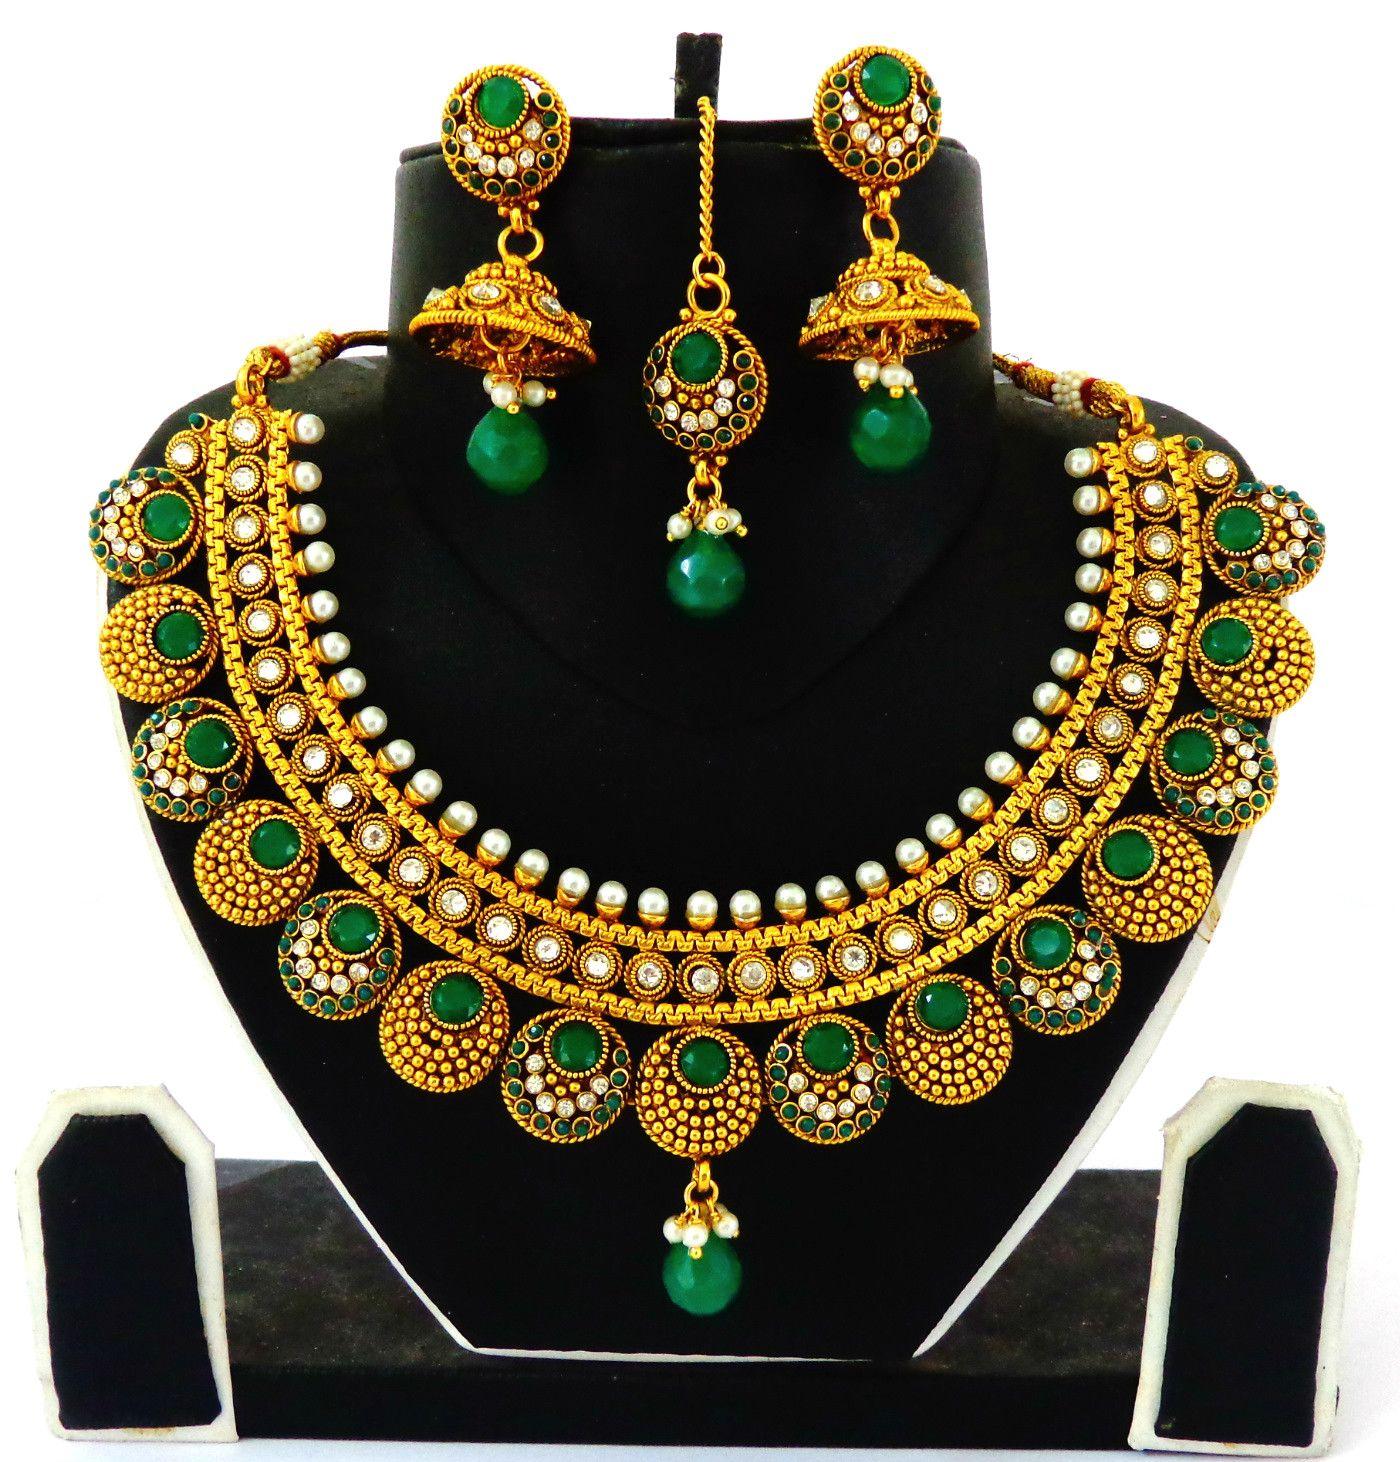 South indian one gram gold necklace visit aftnfashion